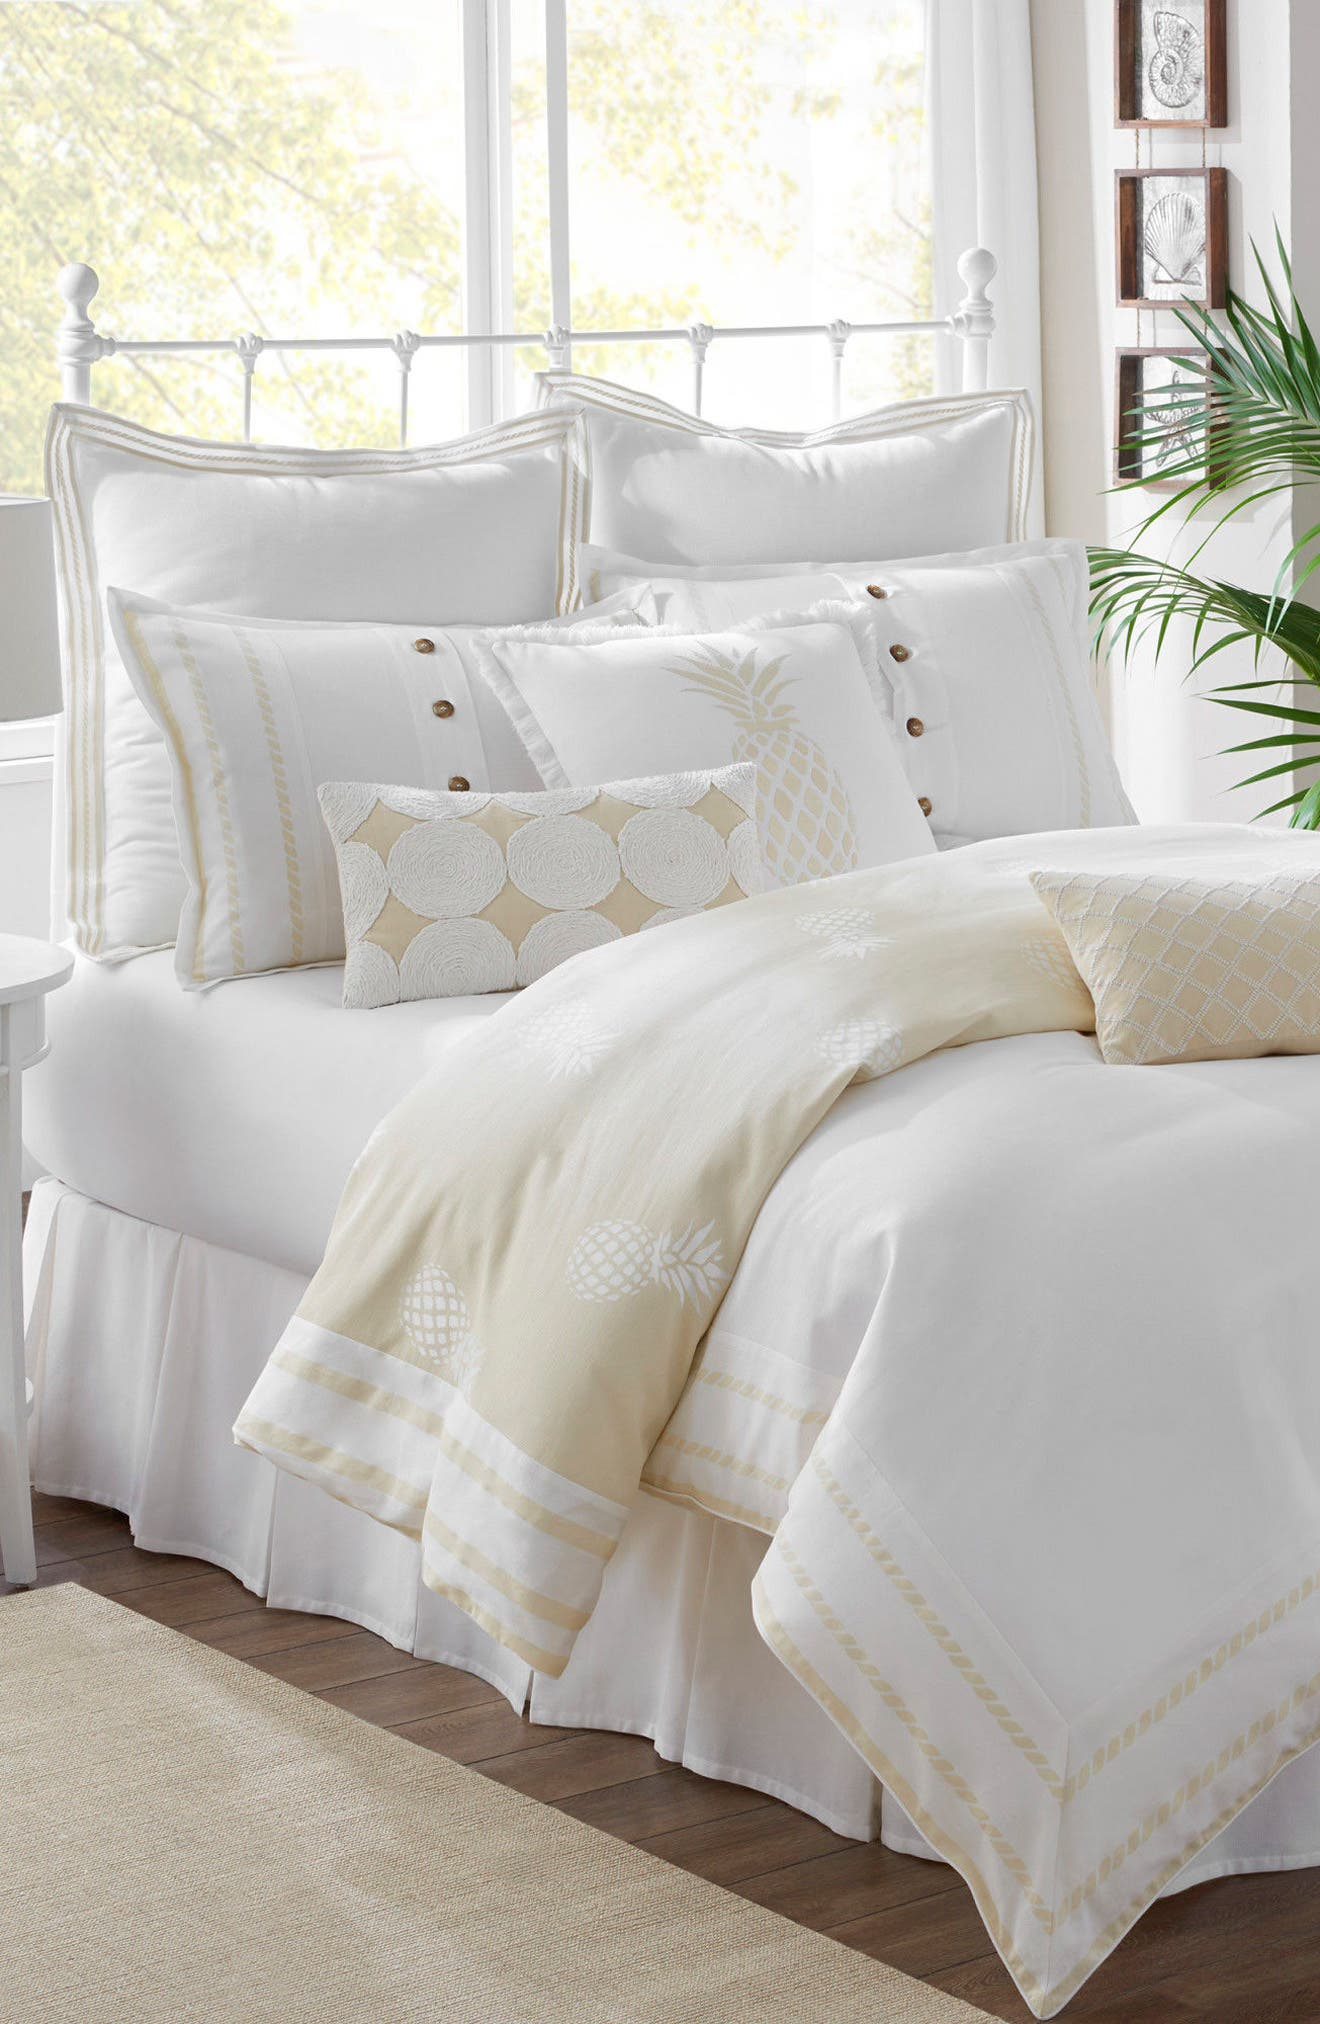 Alternate Image 1 Selected - Southern Tide Southern Hospitality Comforter, Sham & Bed Skirt Set